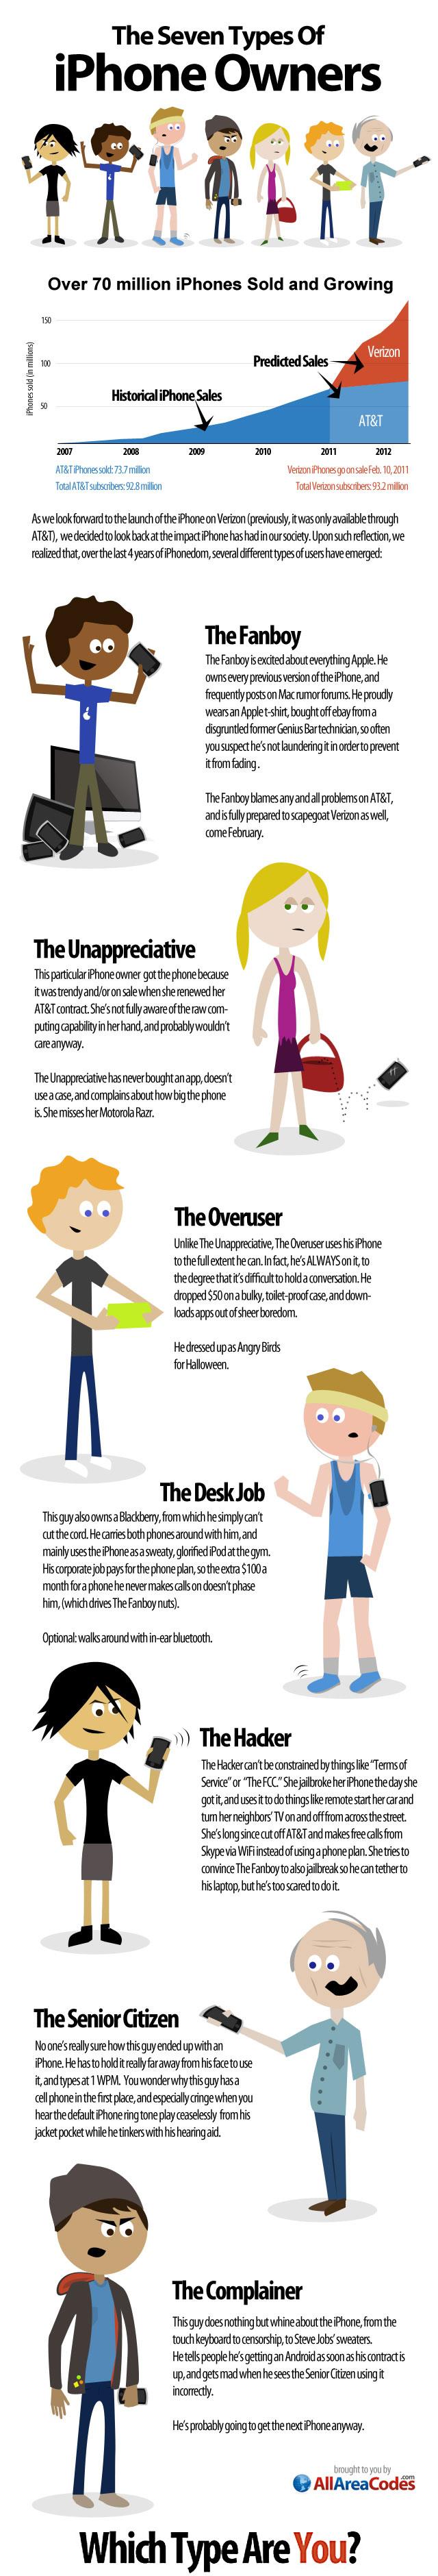 7 tipos de usuario de iPhone